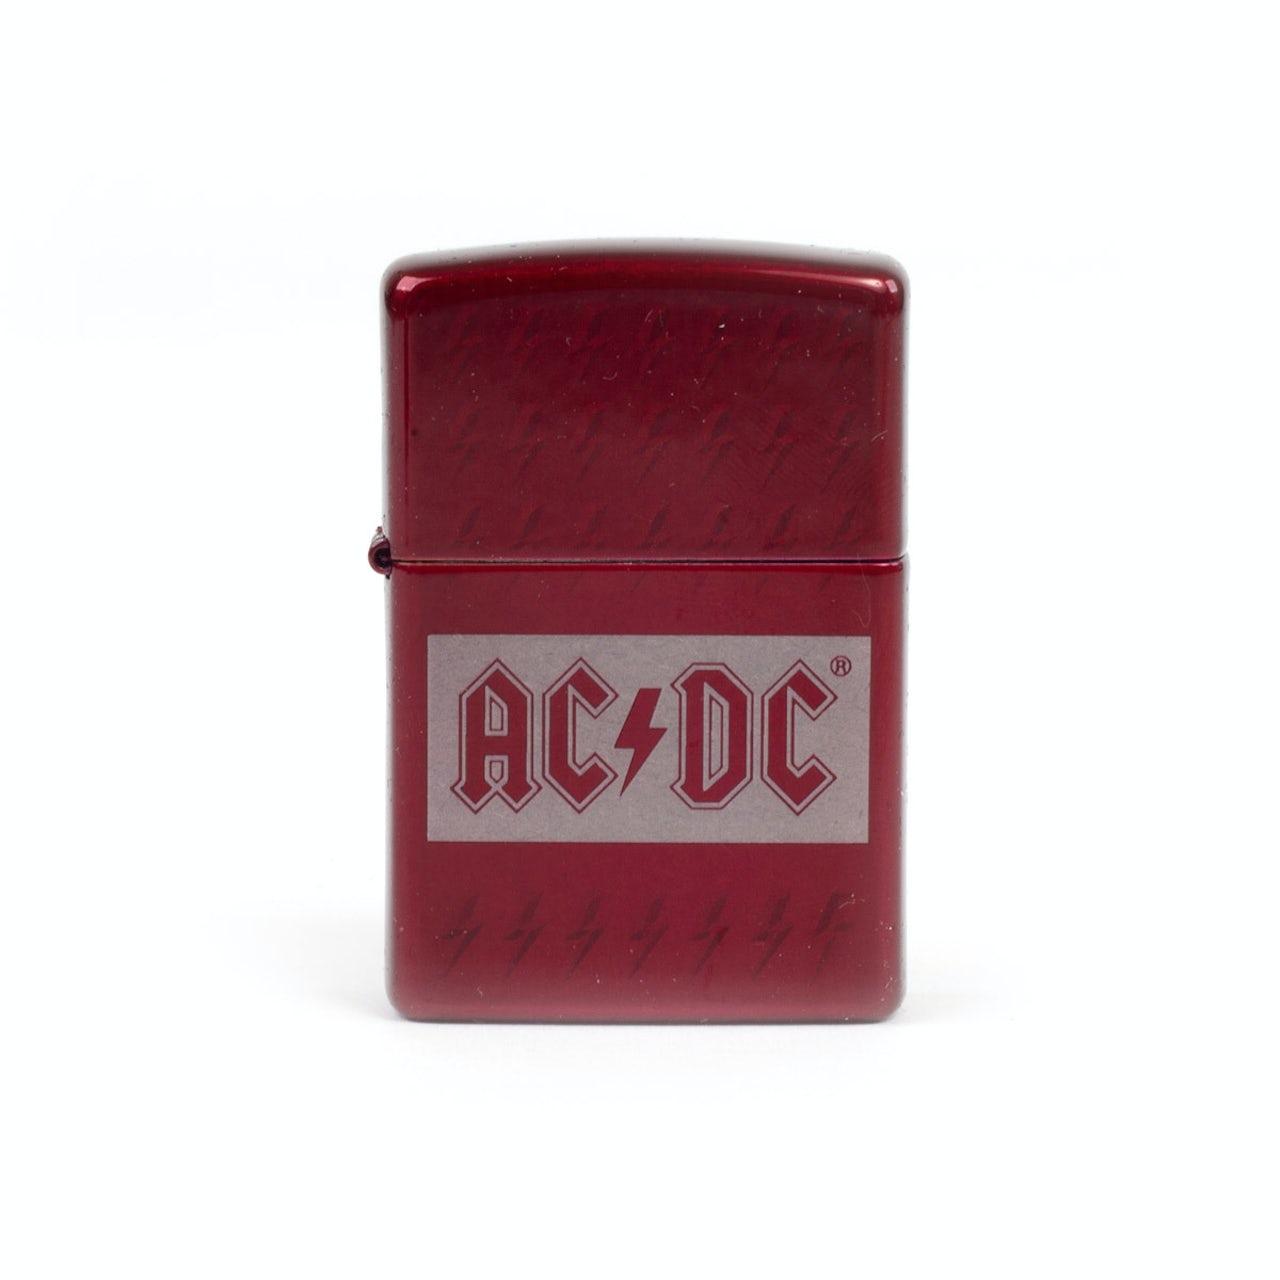 ca5c9ad98368 AC/DC Red Lightning Zippo Lighter